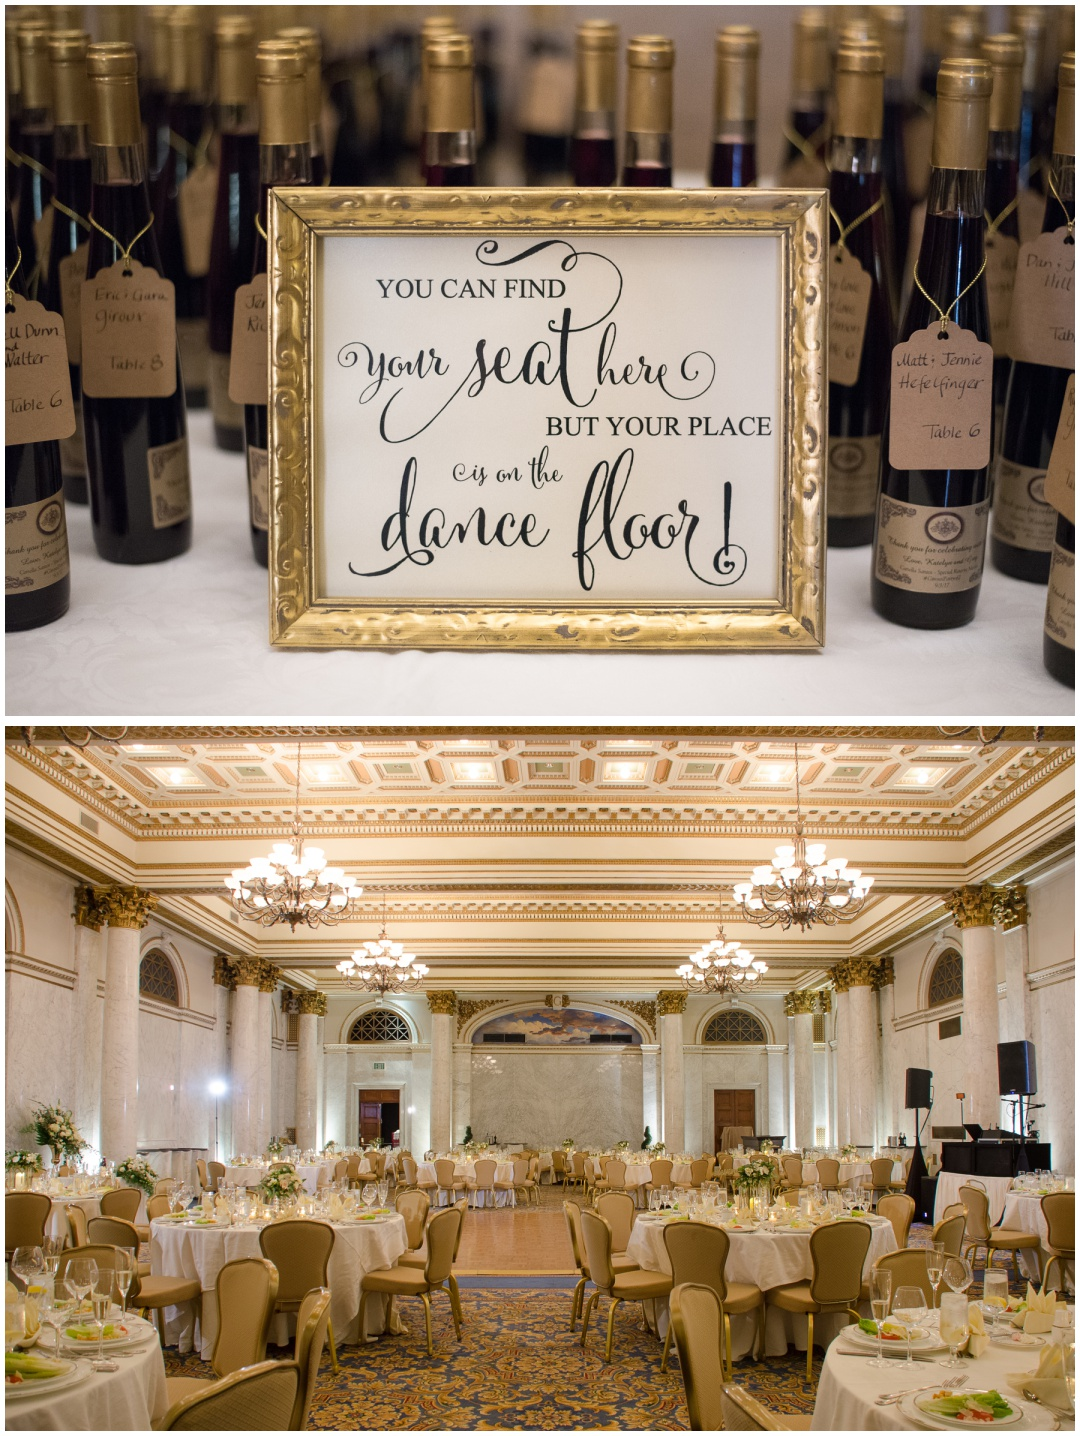 The-Grand-Wedding-Photos-Aaron-Haslinger-Photography_0008.jpg